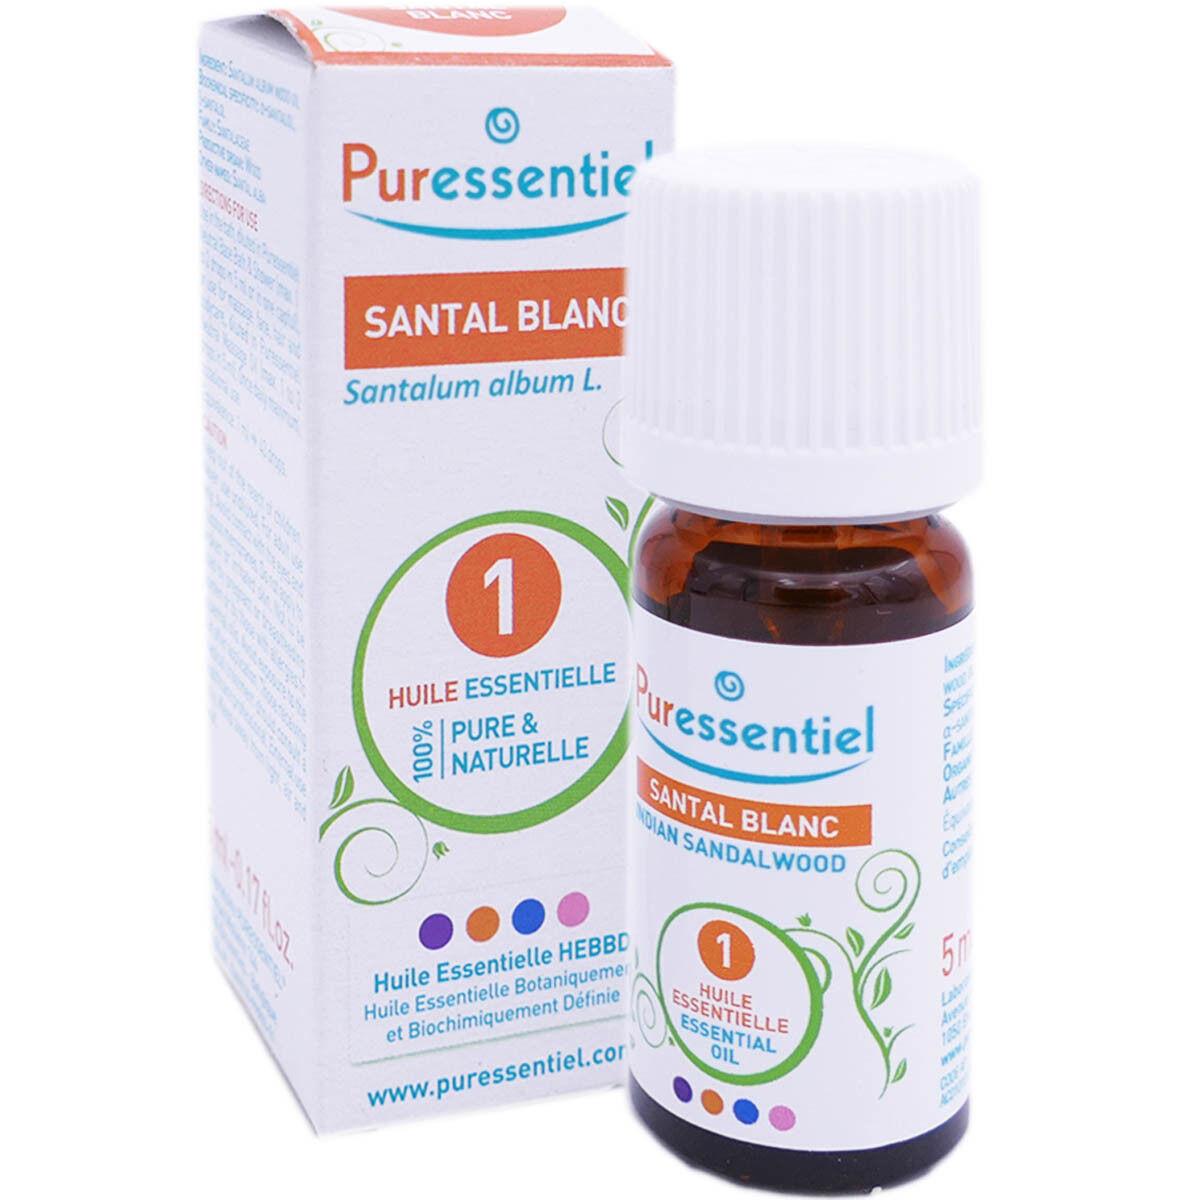 Puressentiel huile essentielle santal blanc 5ml